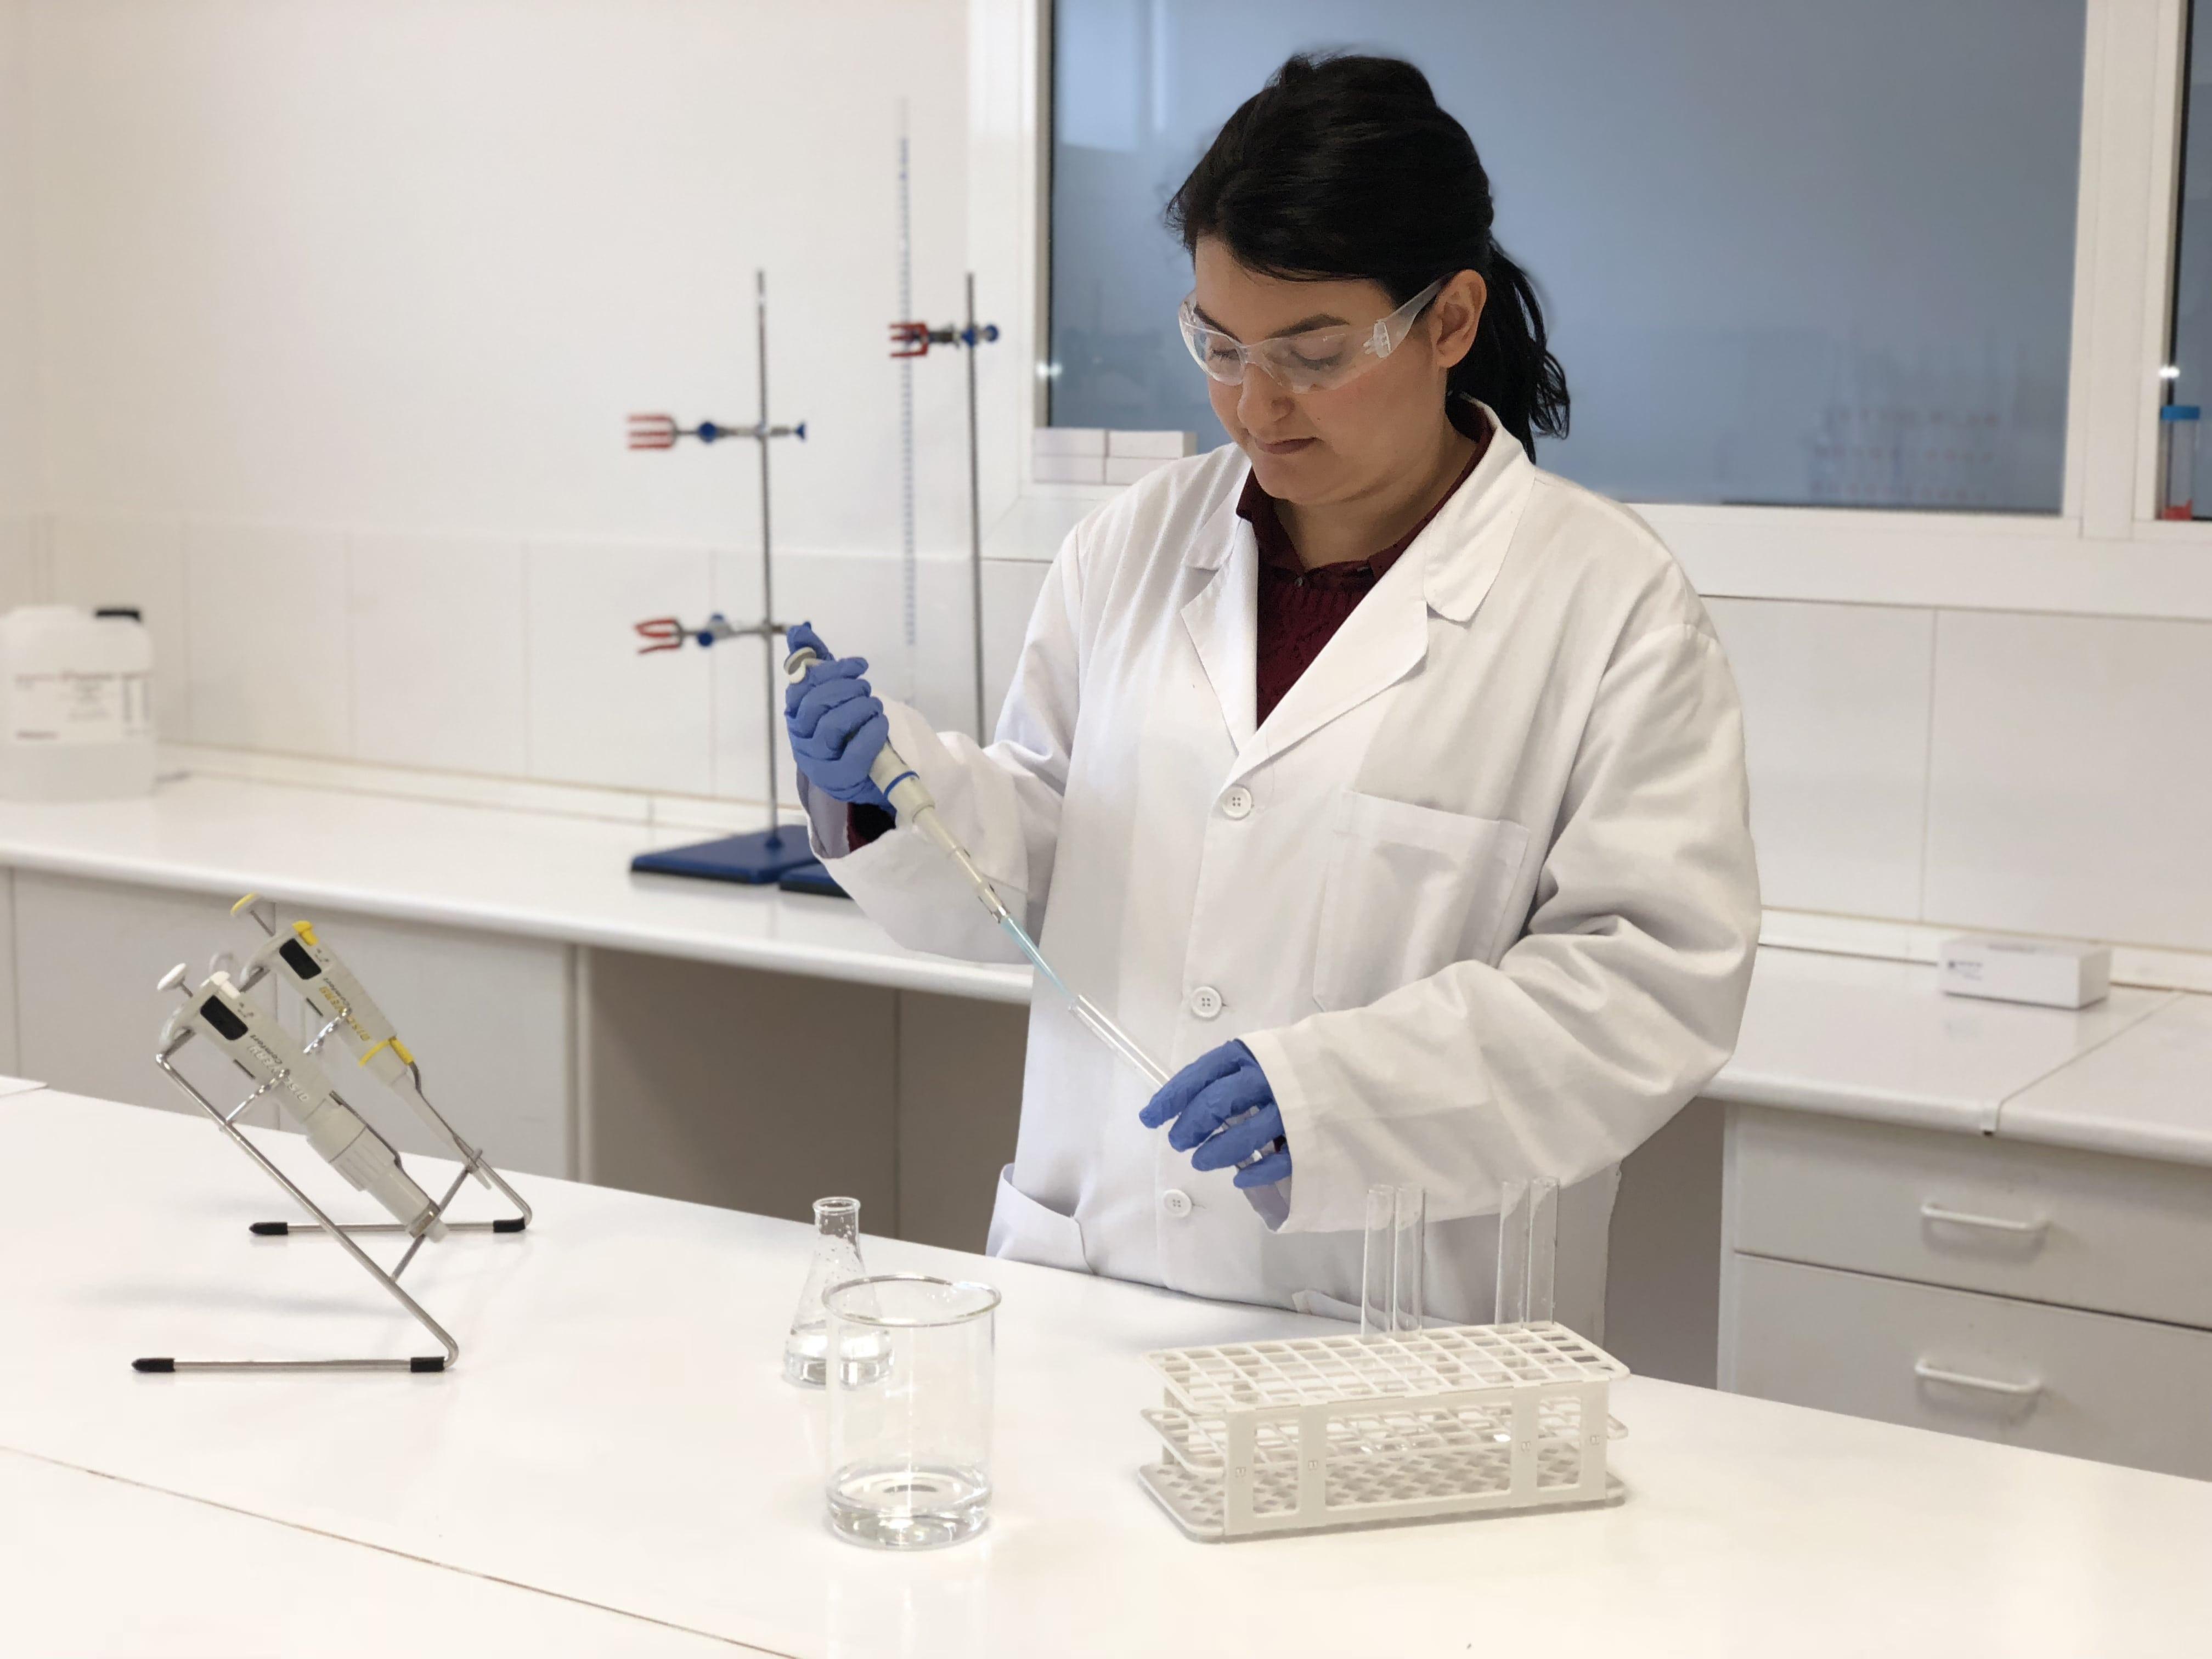 laboratorio geditec